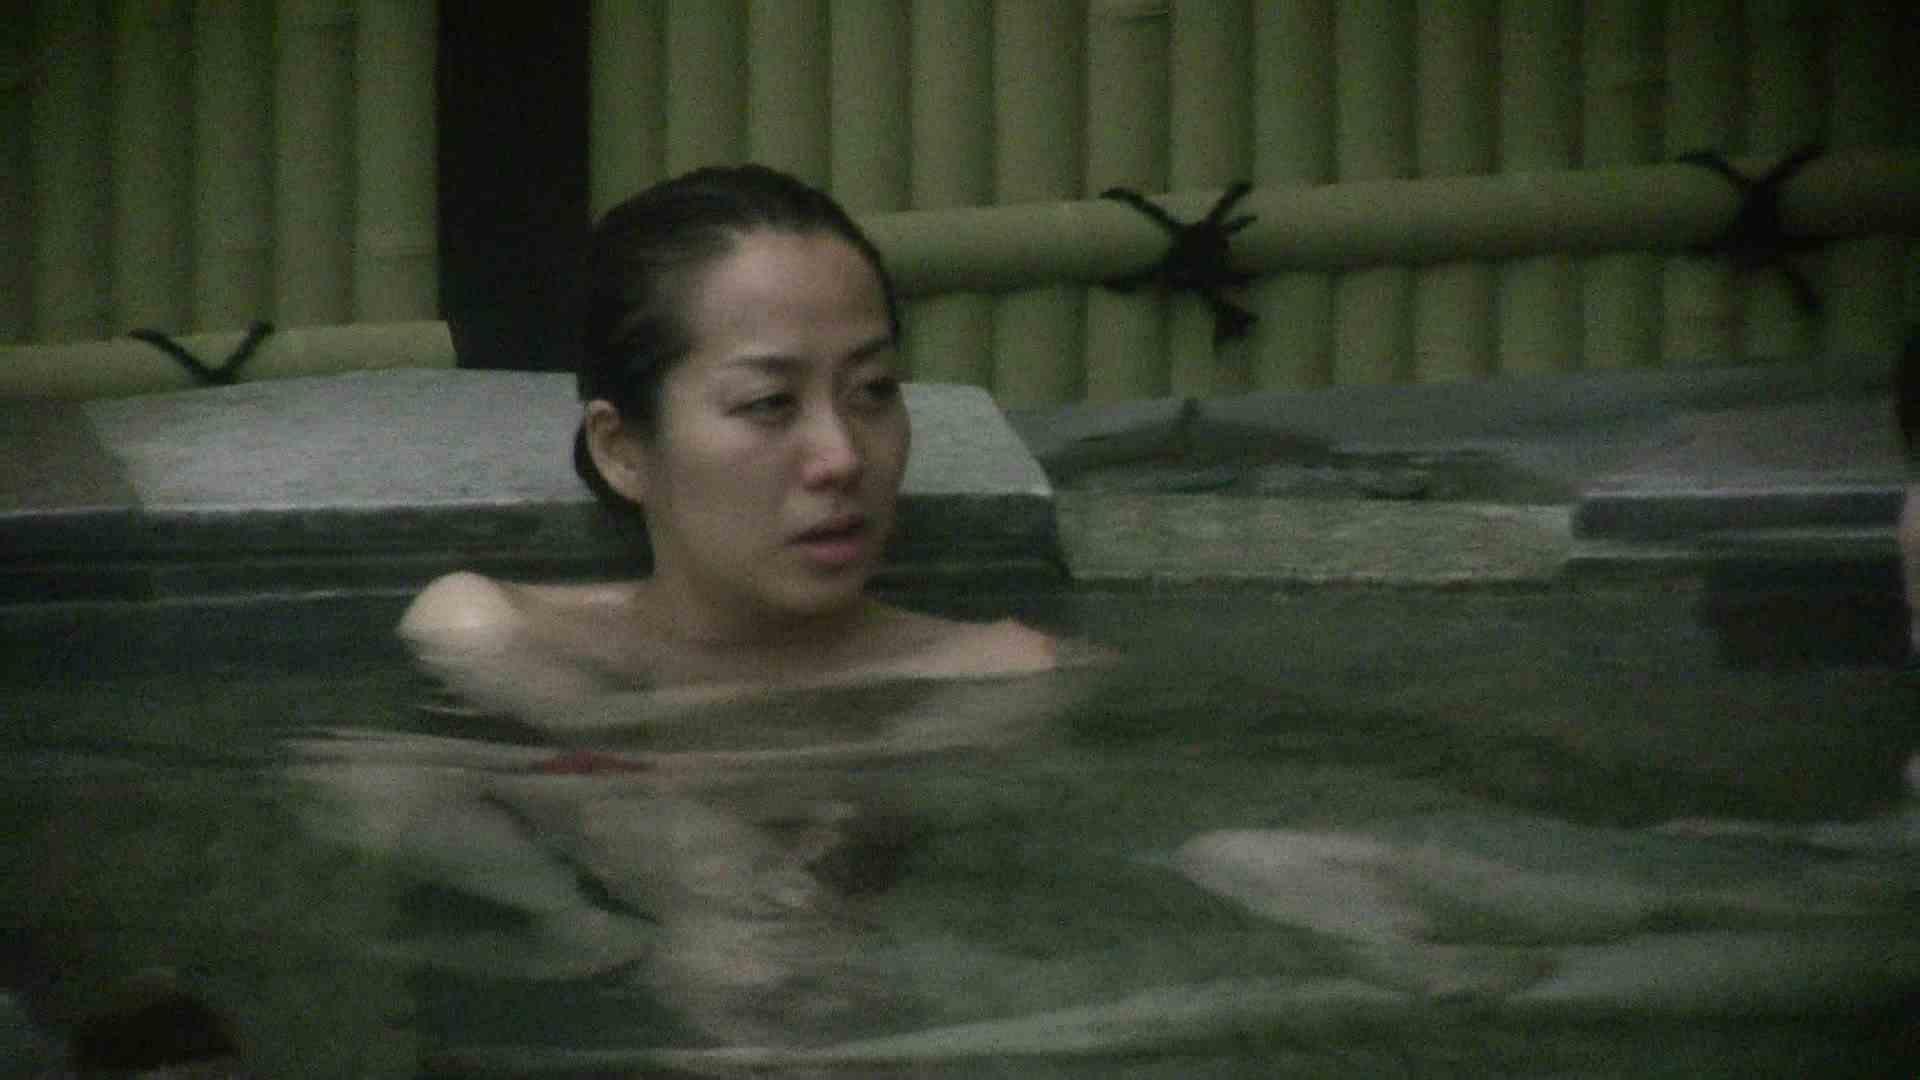 Aquaな露天風呂Vol.539 OL女体  88連発 57